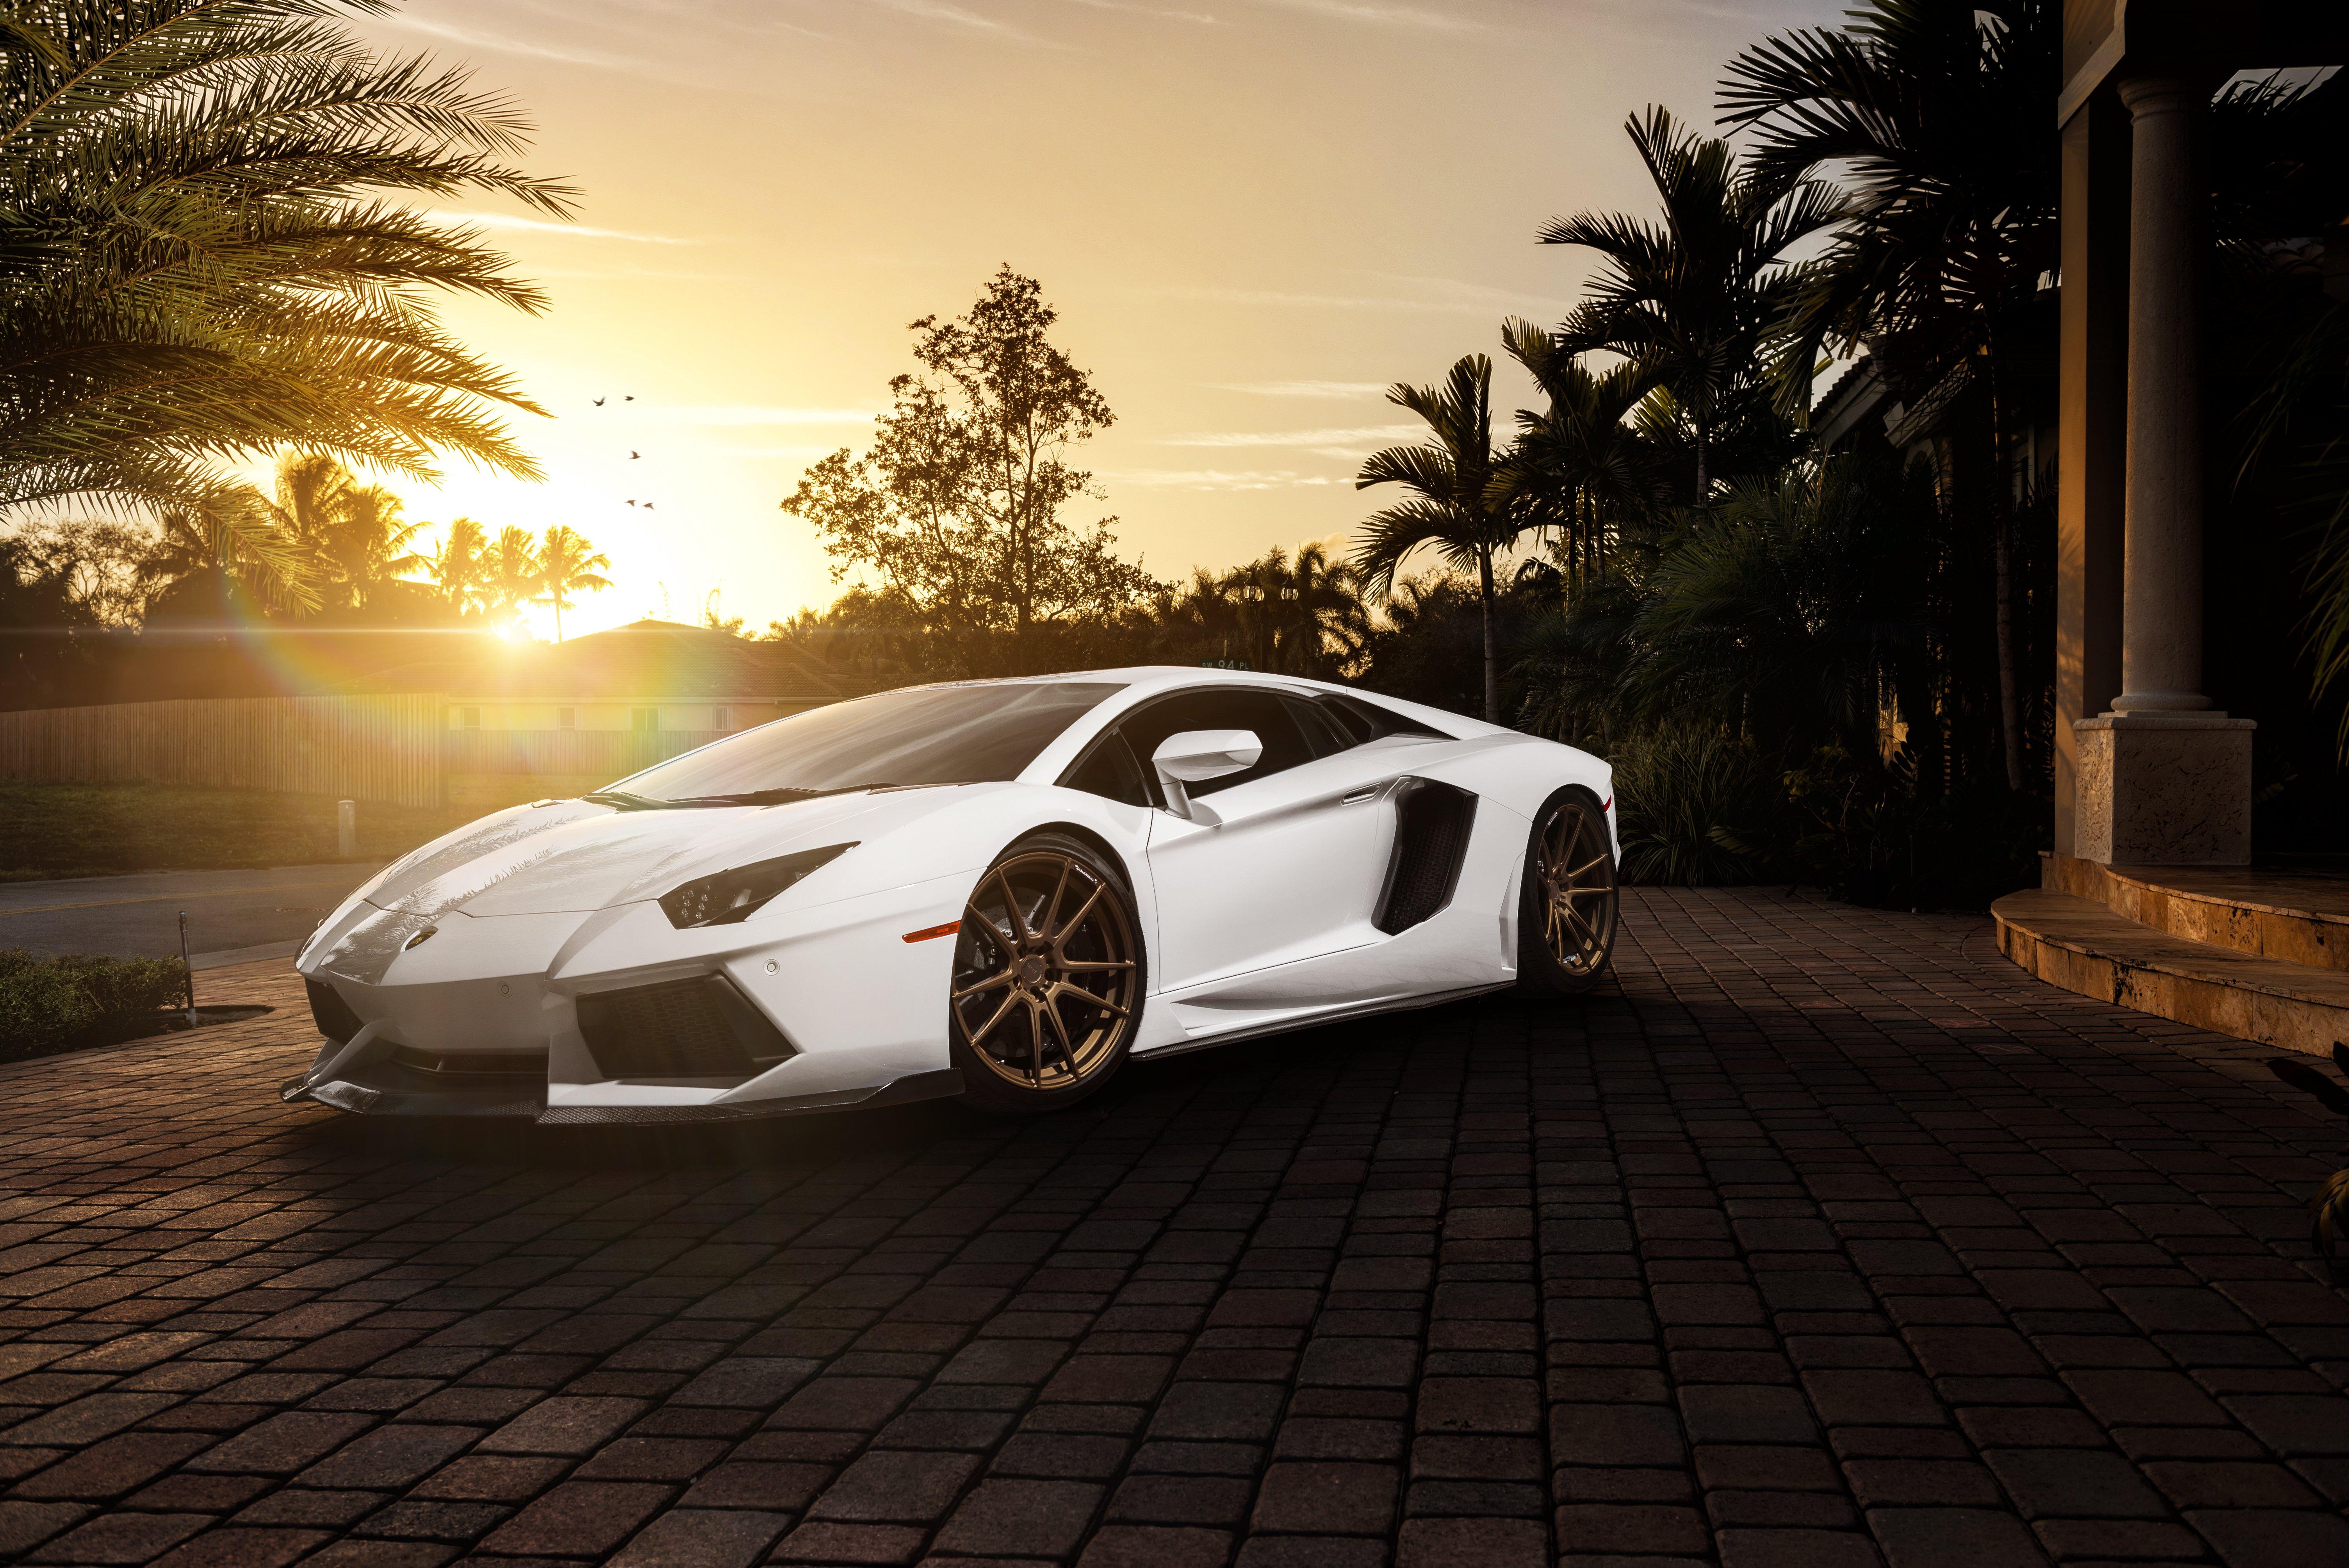 Adv 1 Lamborghini Aventador Wallpaper 6016x4016 371062 Wallpaperup